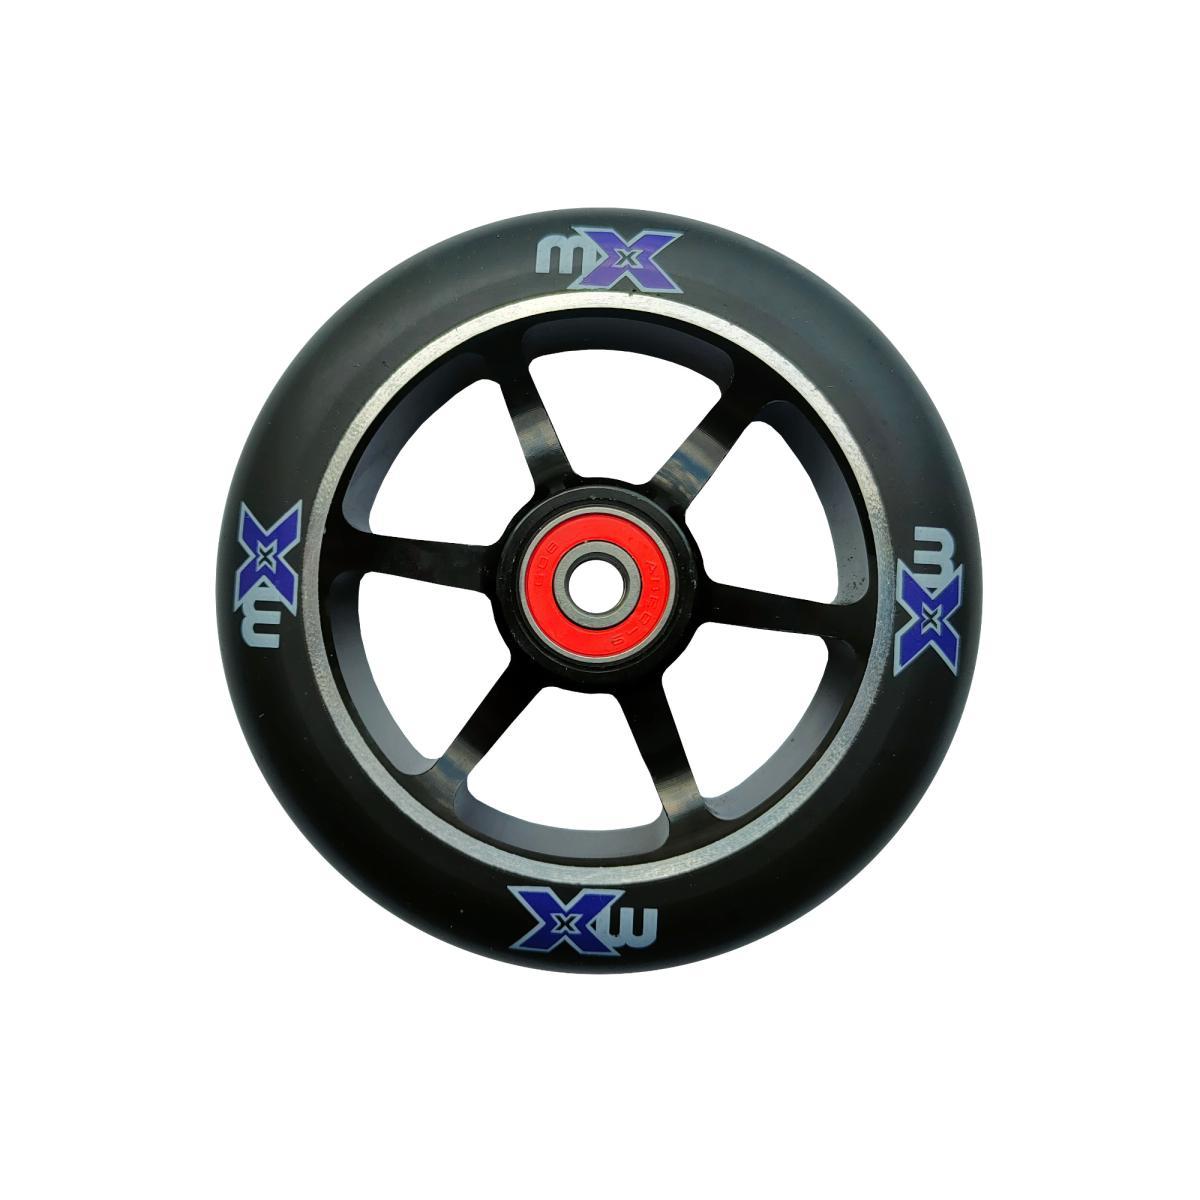 Kolečko Micro MX 110 mm Black